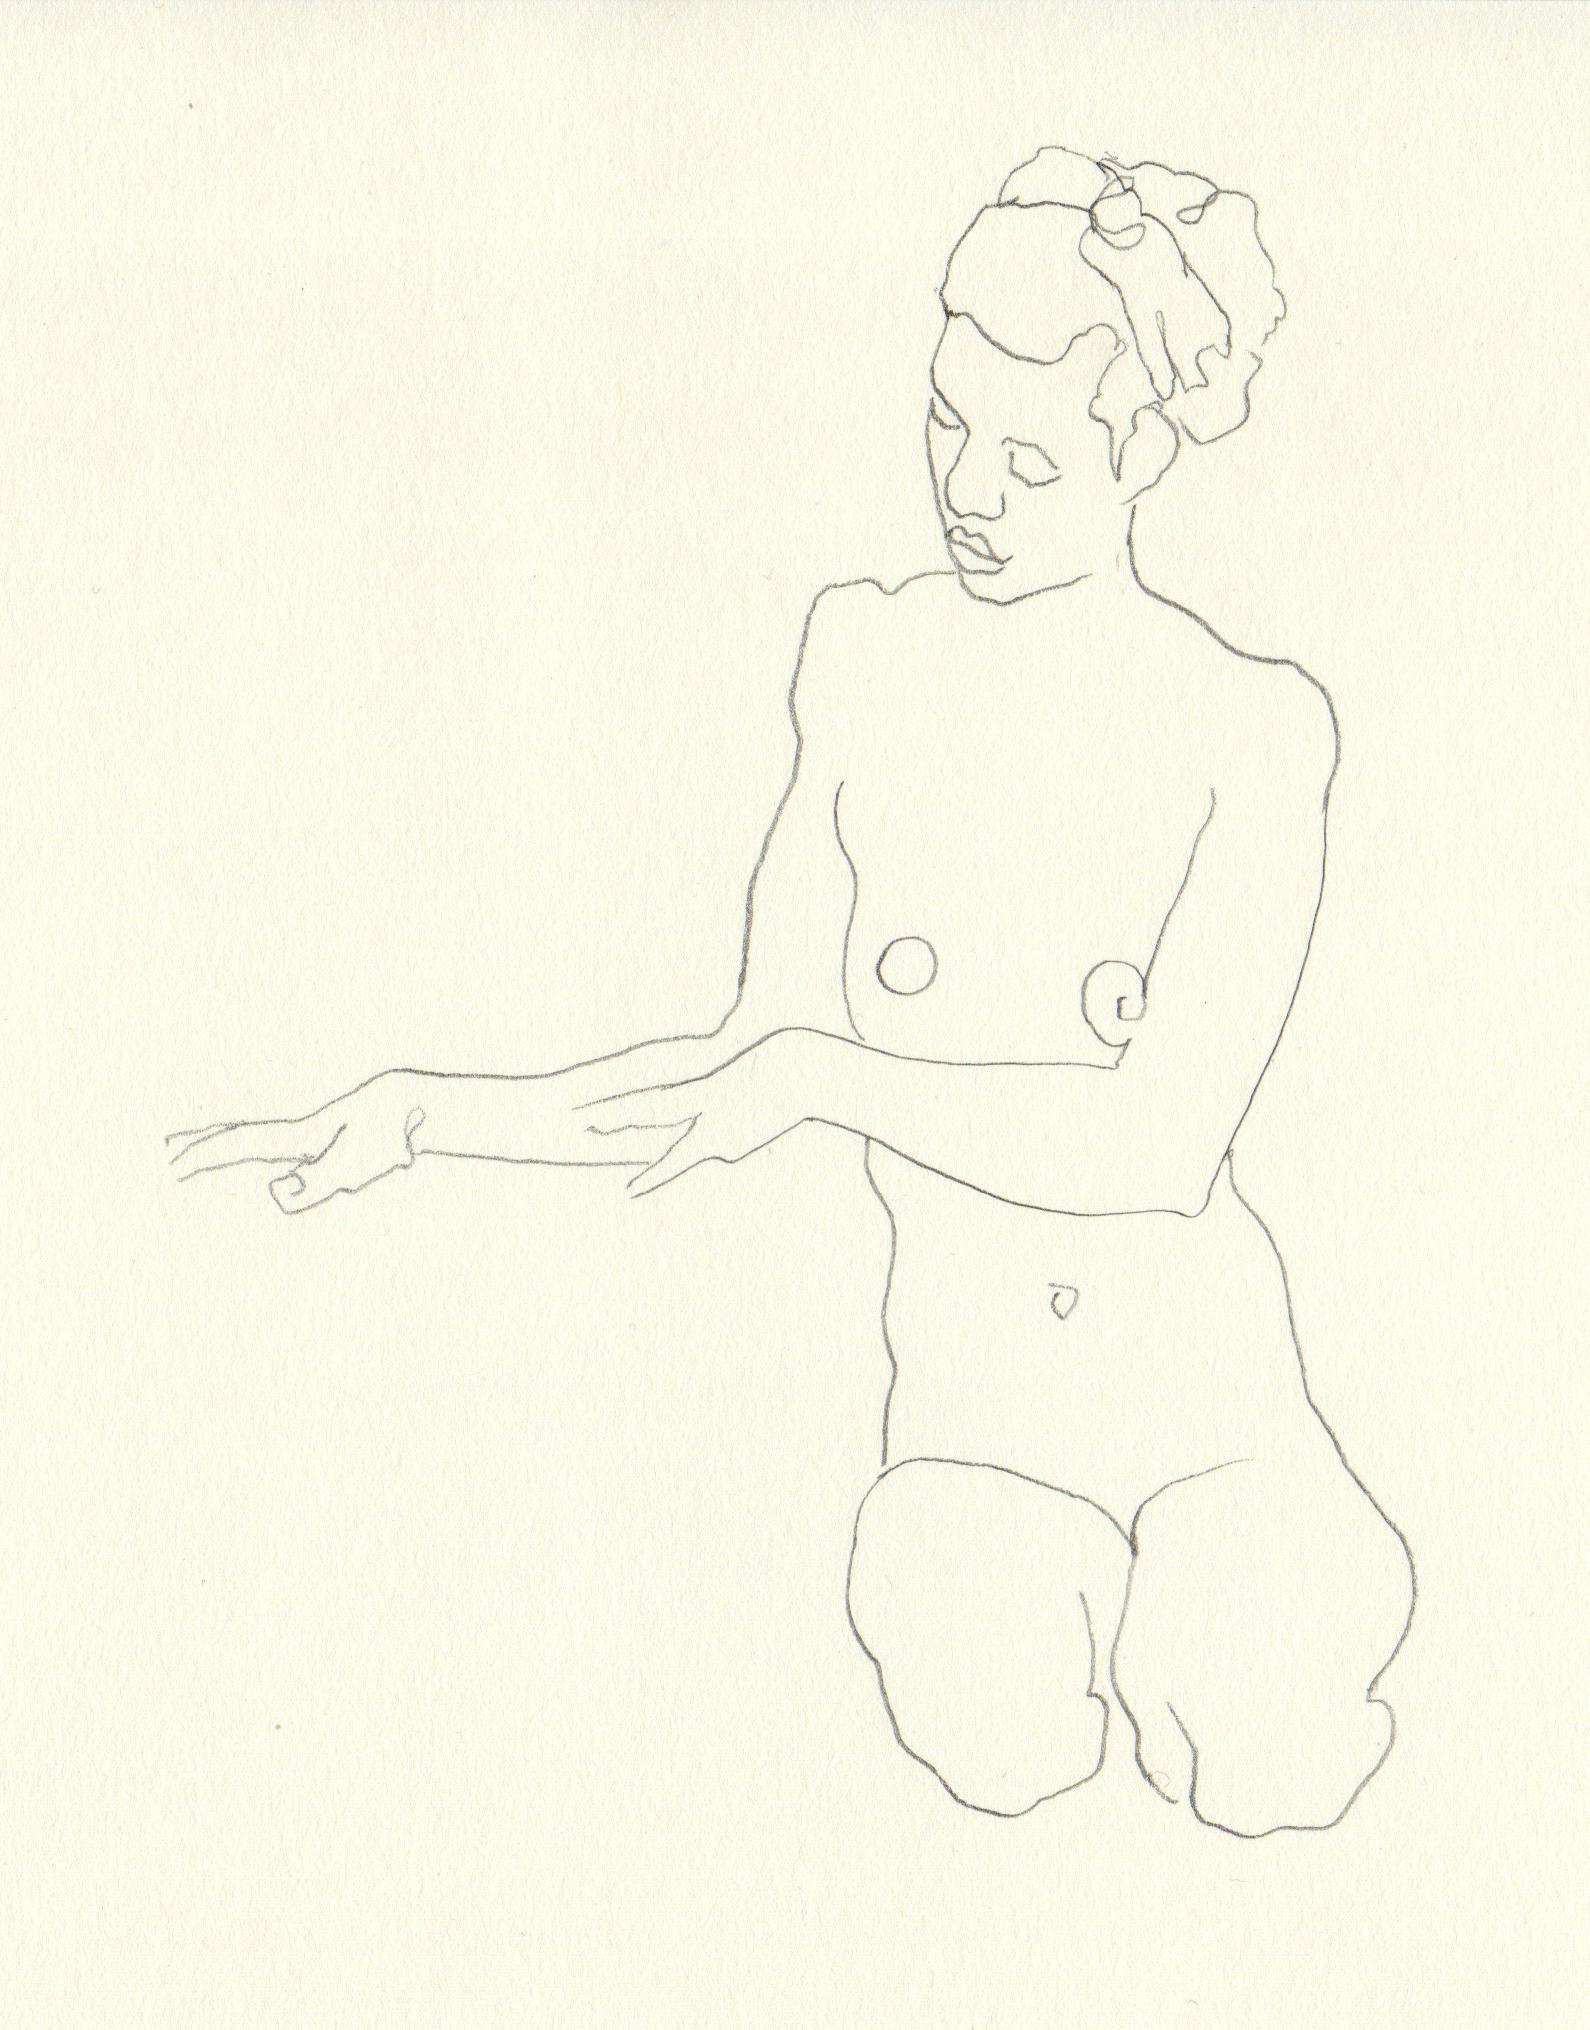 2012_Sketch_F-Beudin_074